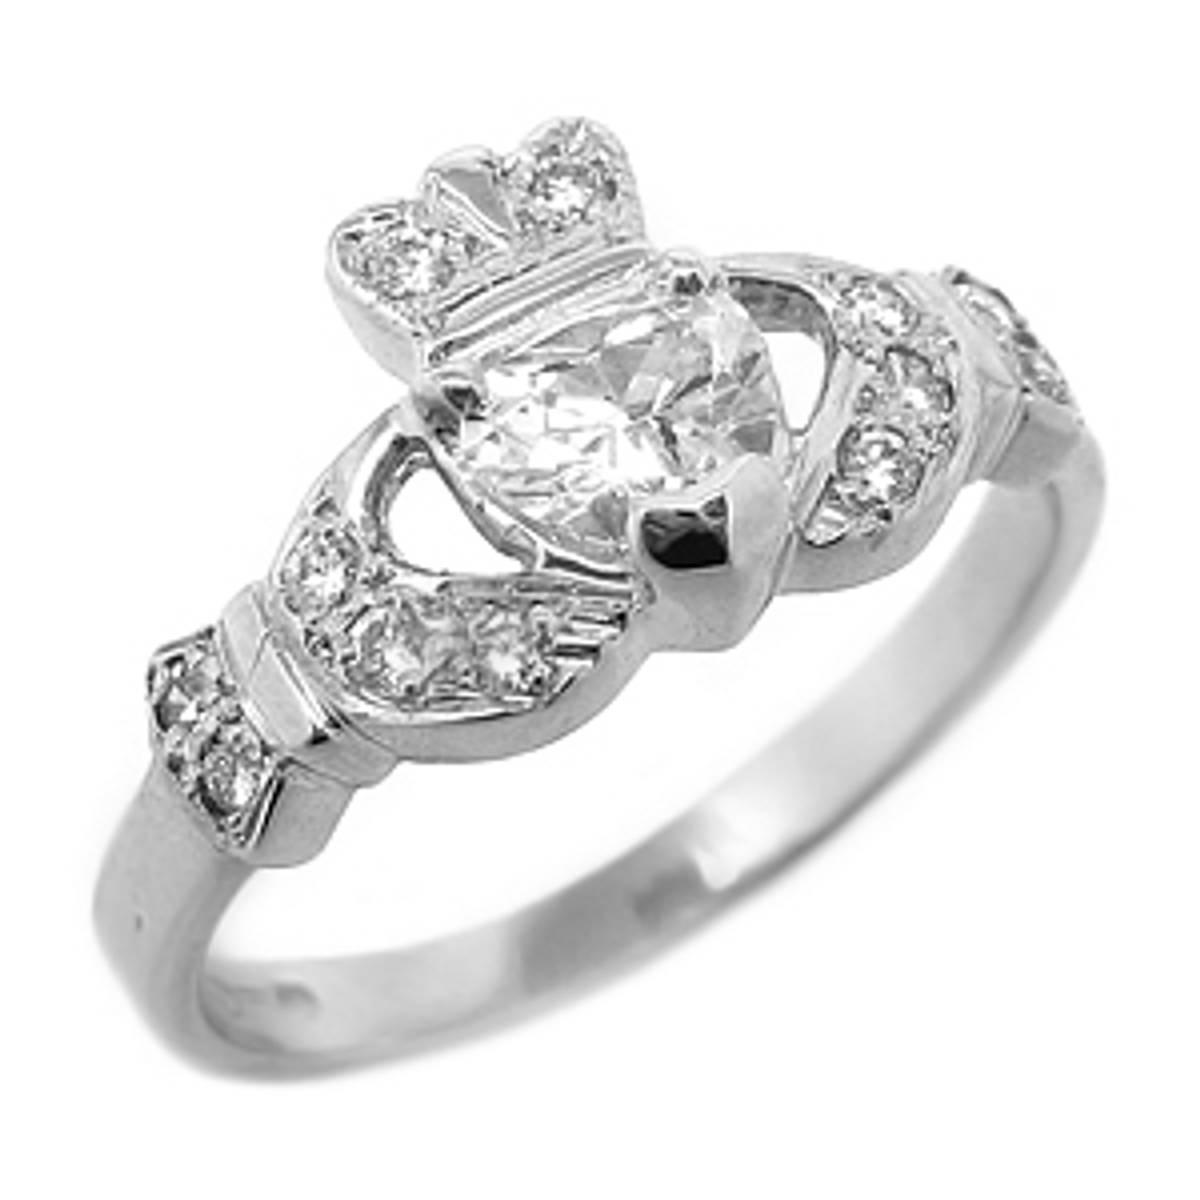 Irish made14 carat white gold 0.45cts/0.12cts diamonds claddagh engagement ring